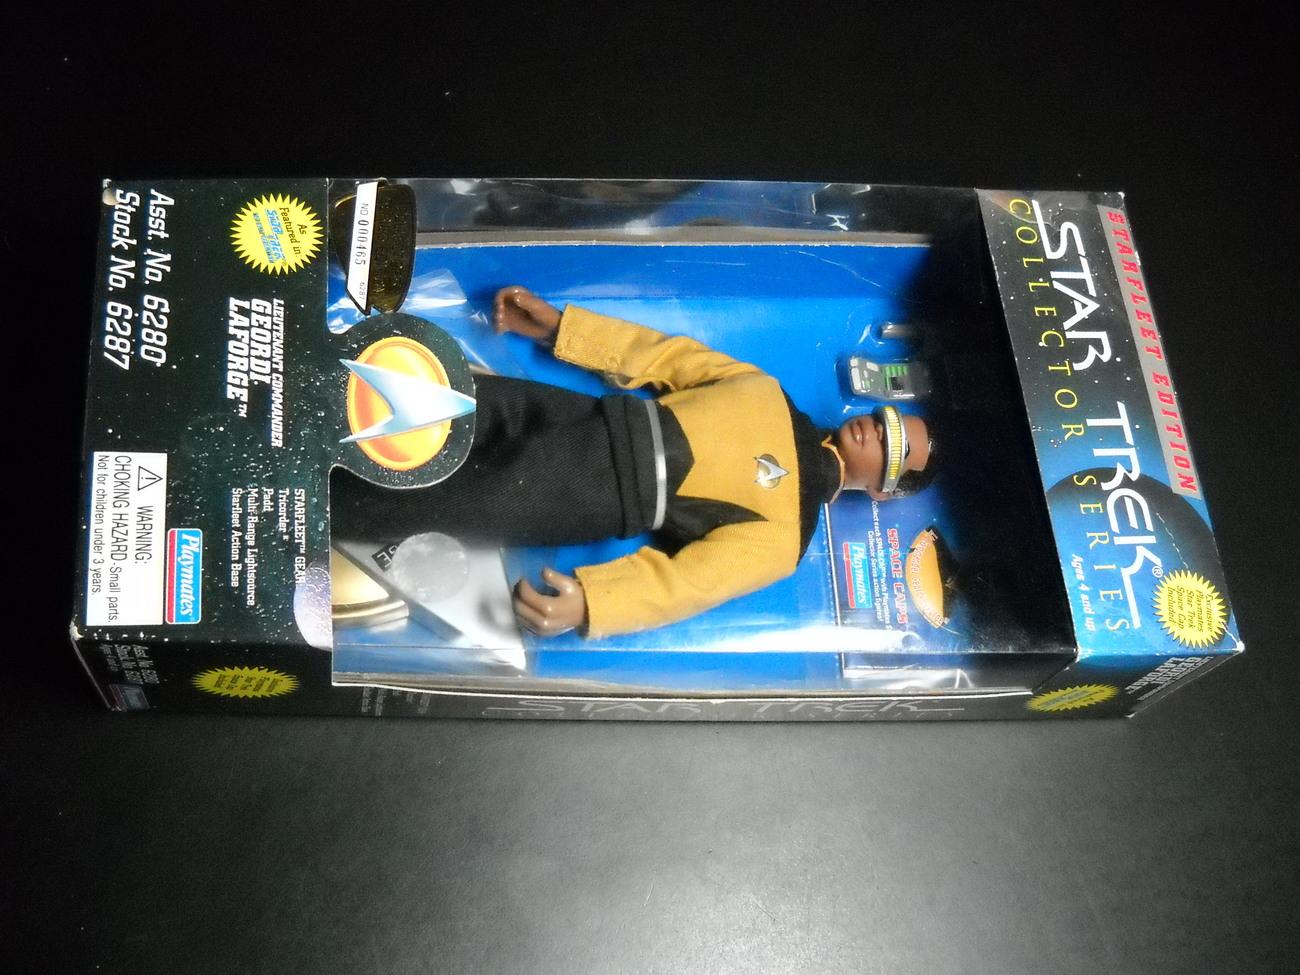 Toy star trek playmates starfleet edition lieutenant commander geordi laforge 1995 9 inch boxed sealed 01